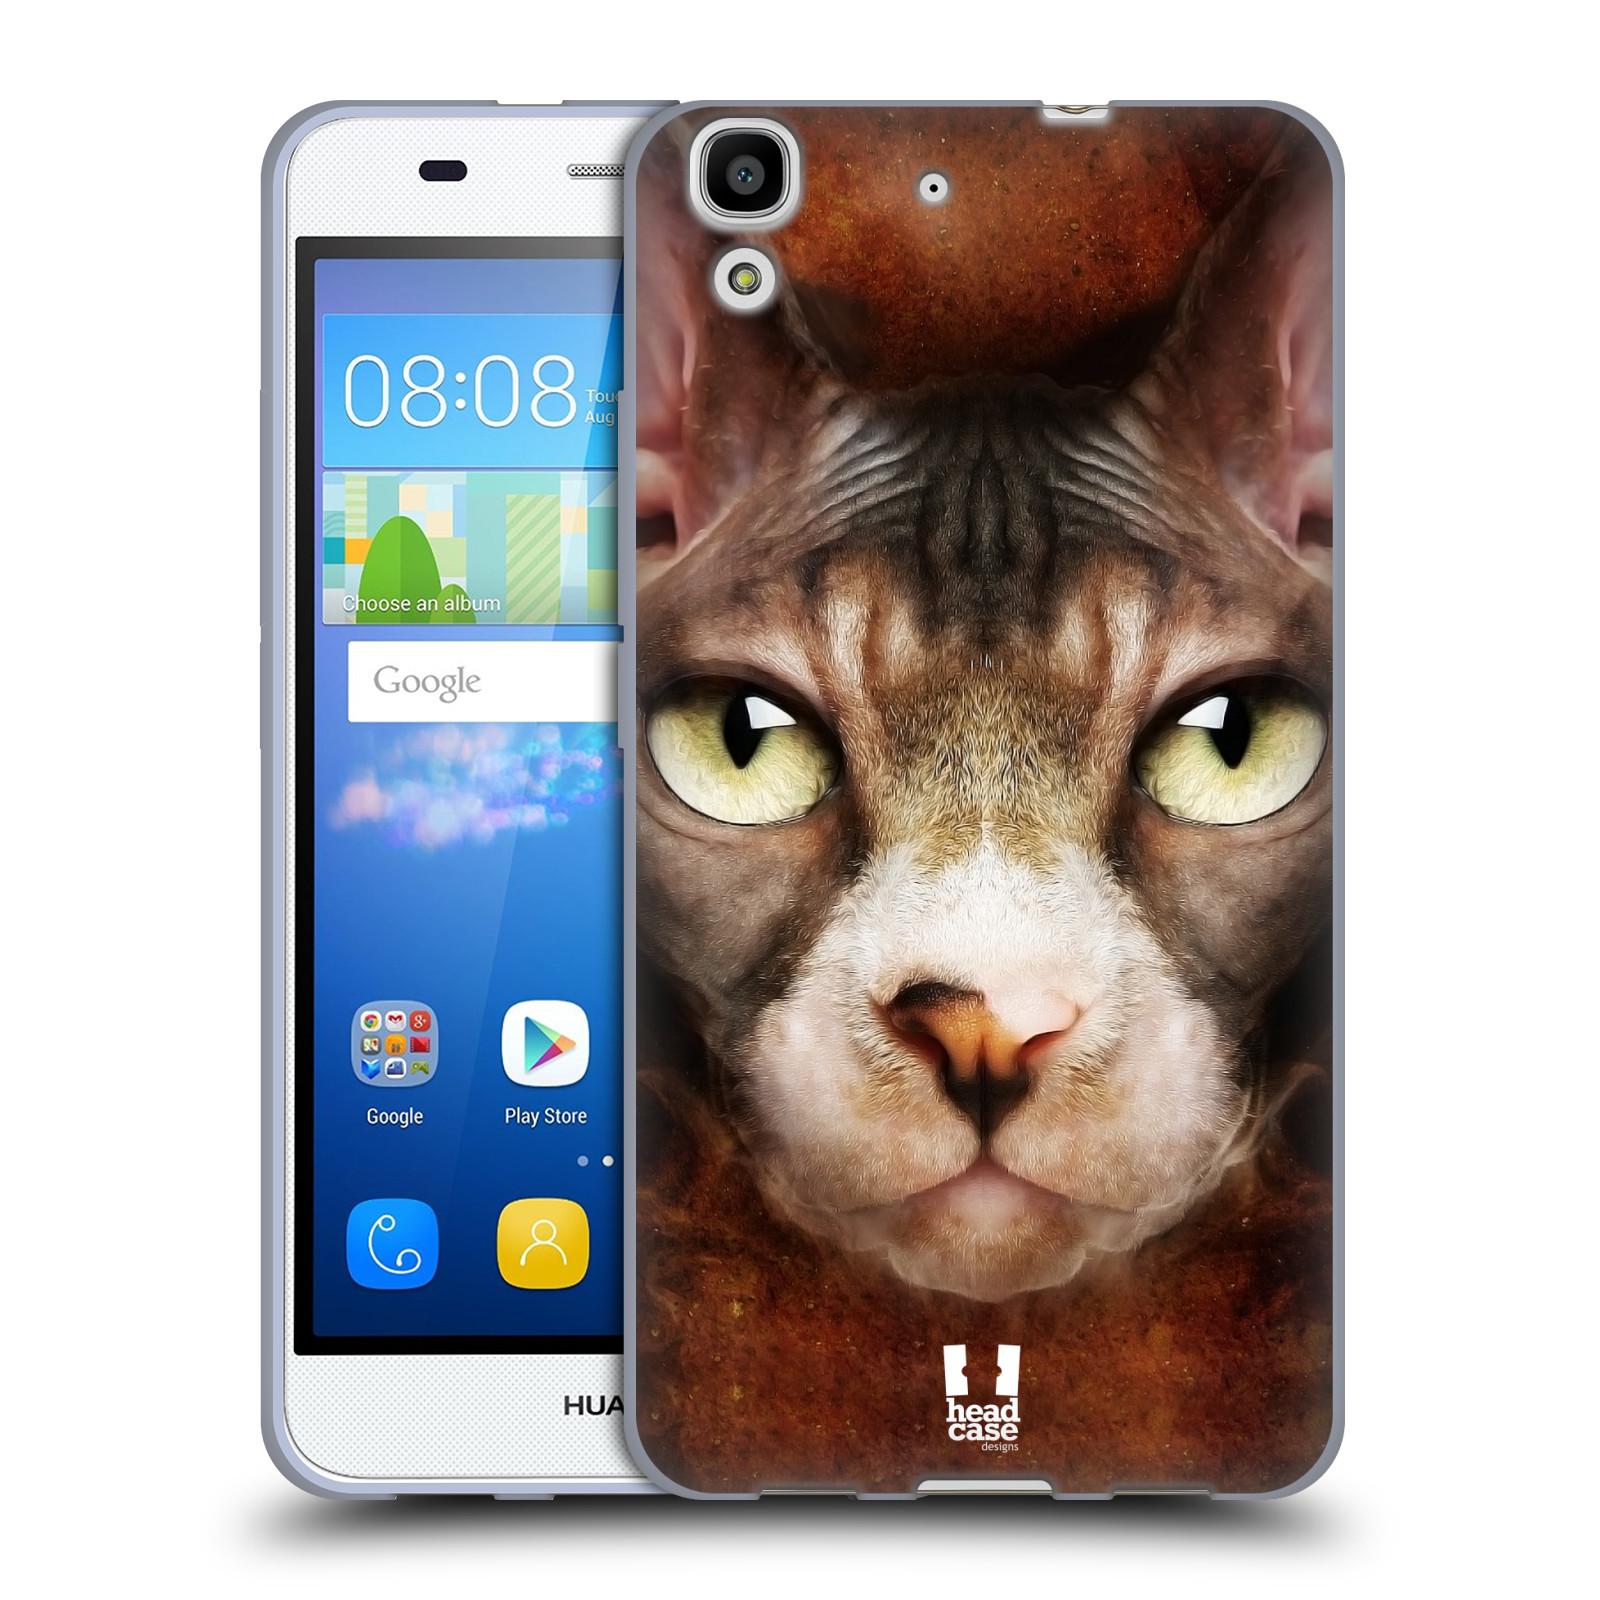 HEAD CASE silikonový obal na mobil HUAWEI Y6 vzor Zvířecí tváře kočka sphynx